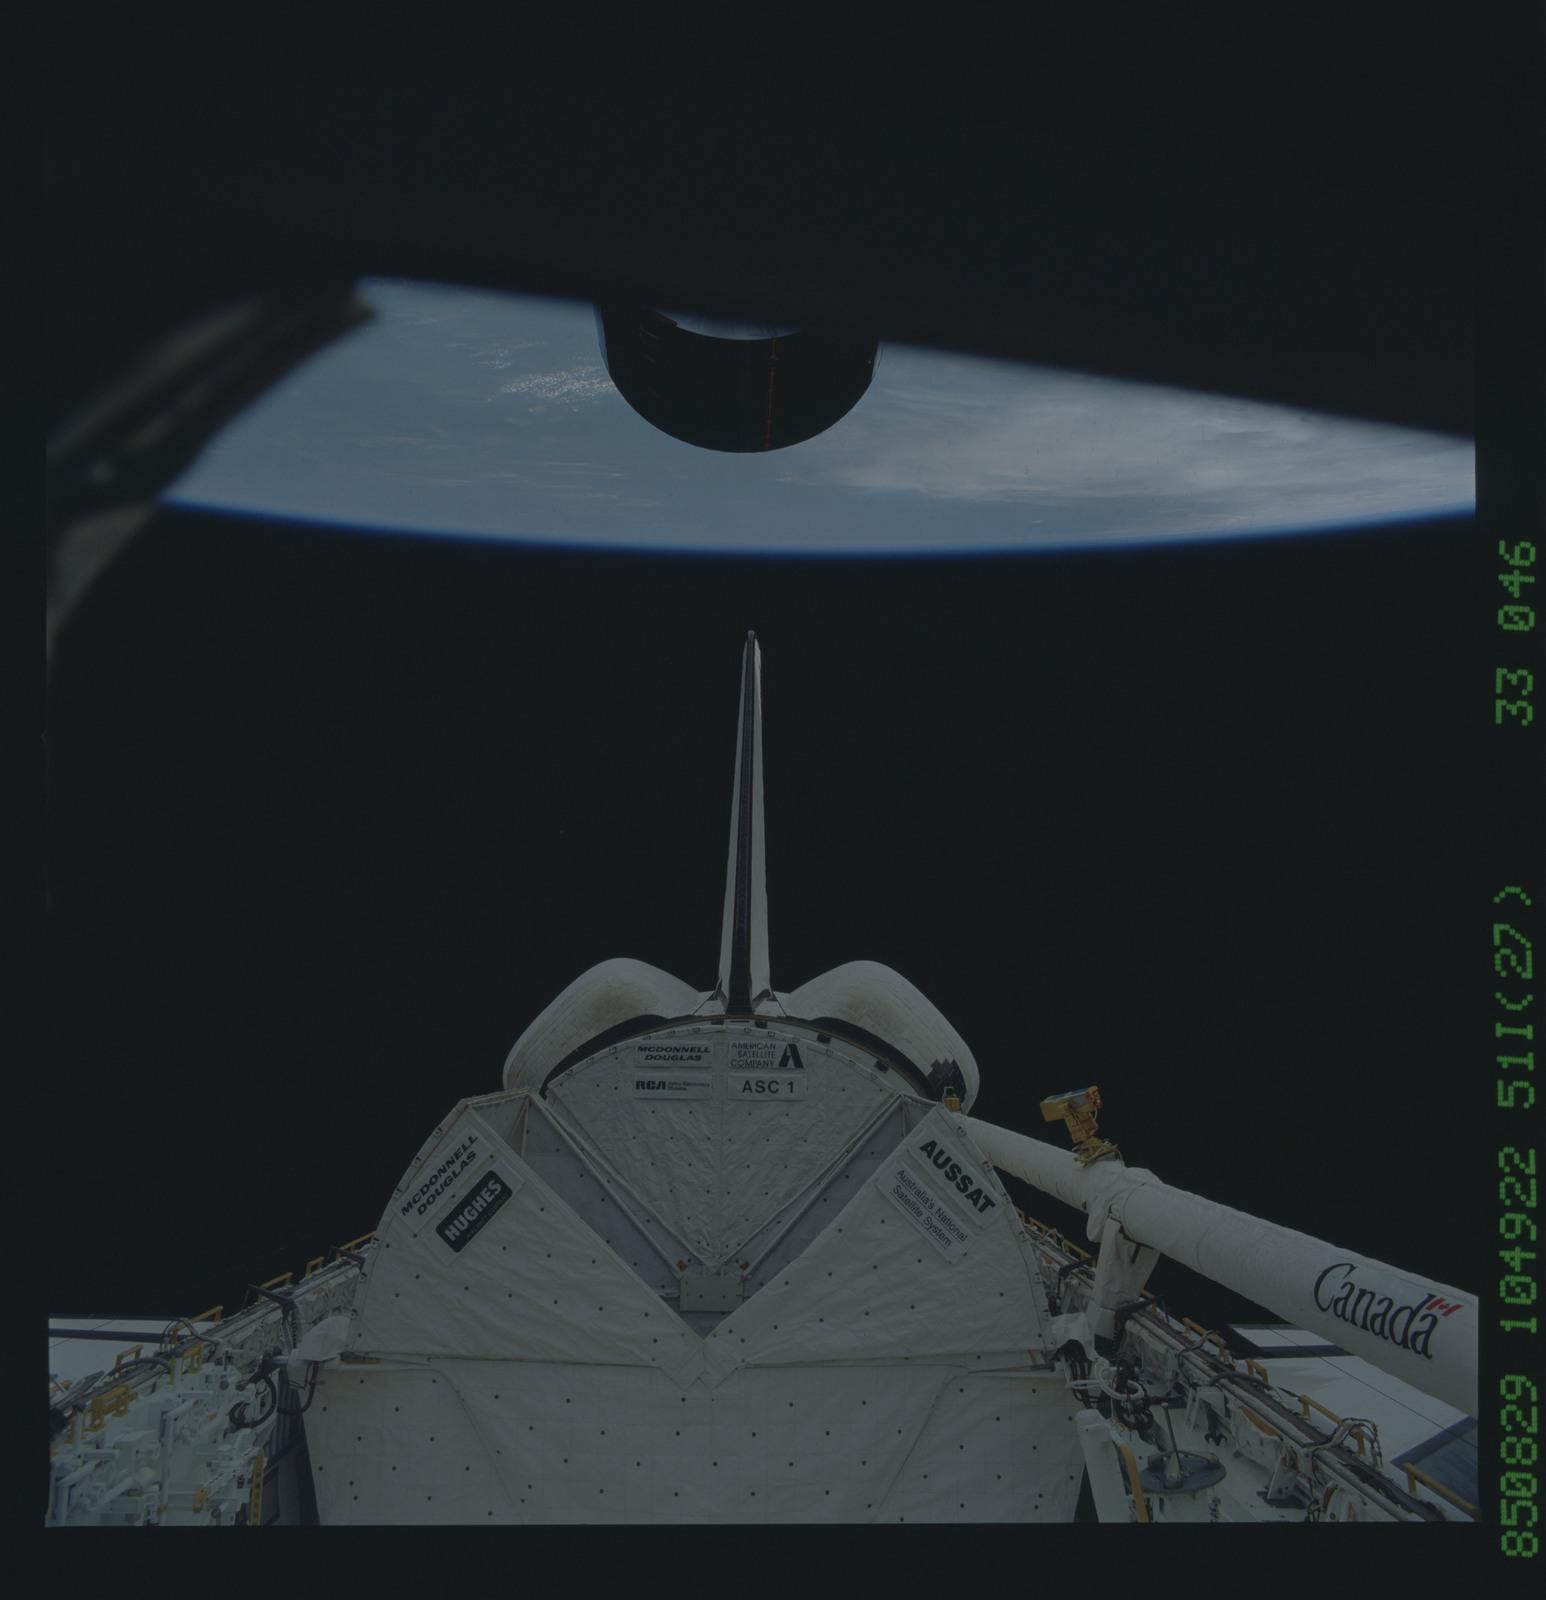 51I-33-046 - STS-51I - Syncom-IV communication satellite deploys from payload bay